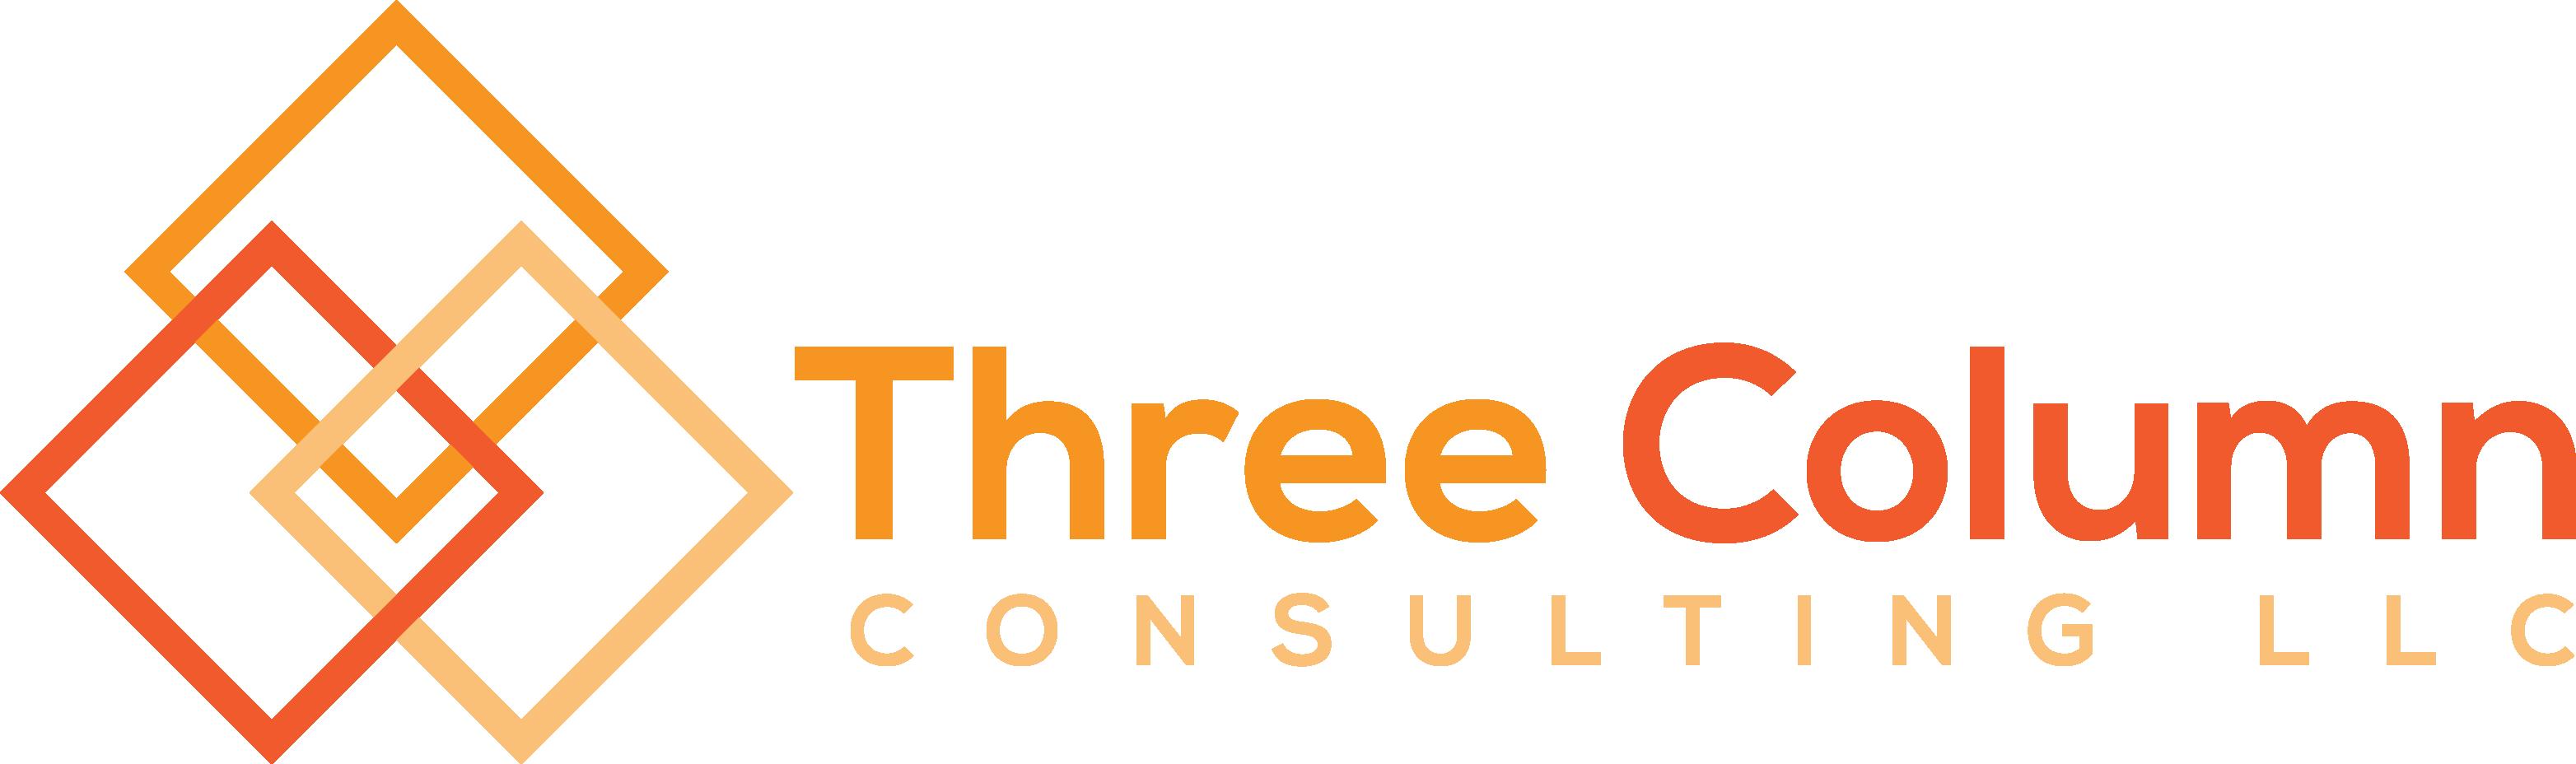 Three Column Consulting LLC.